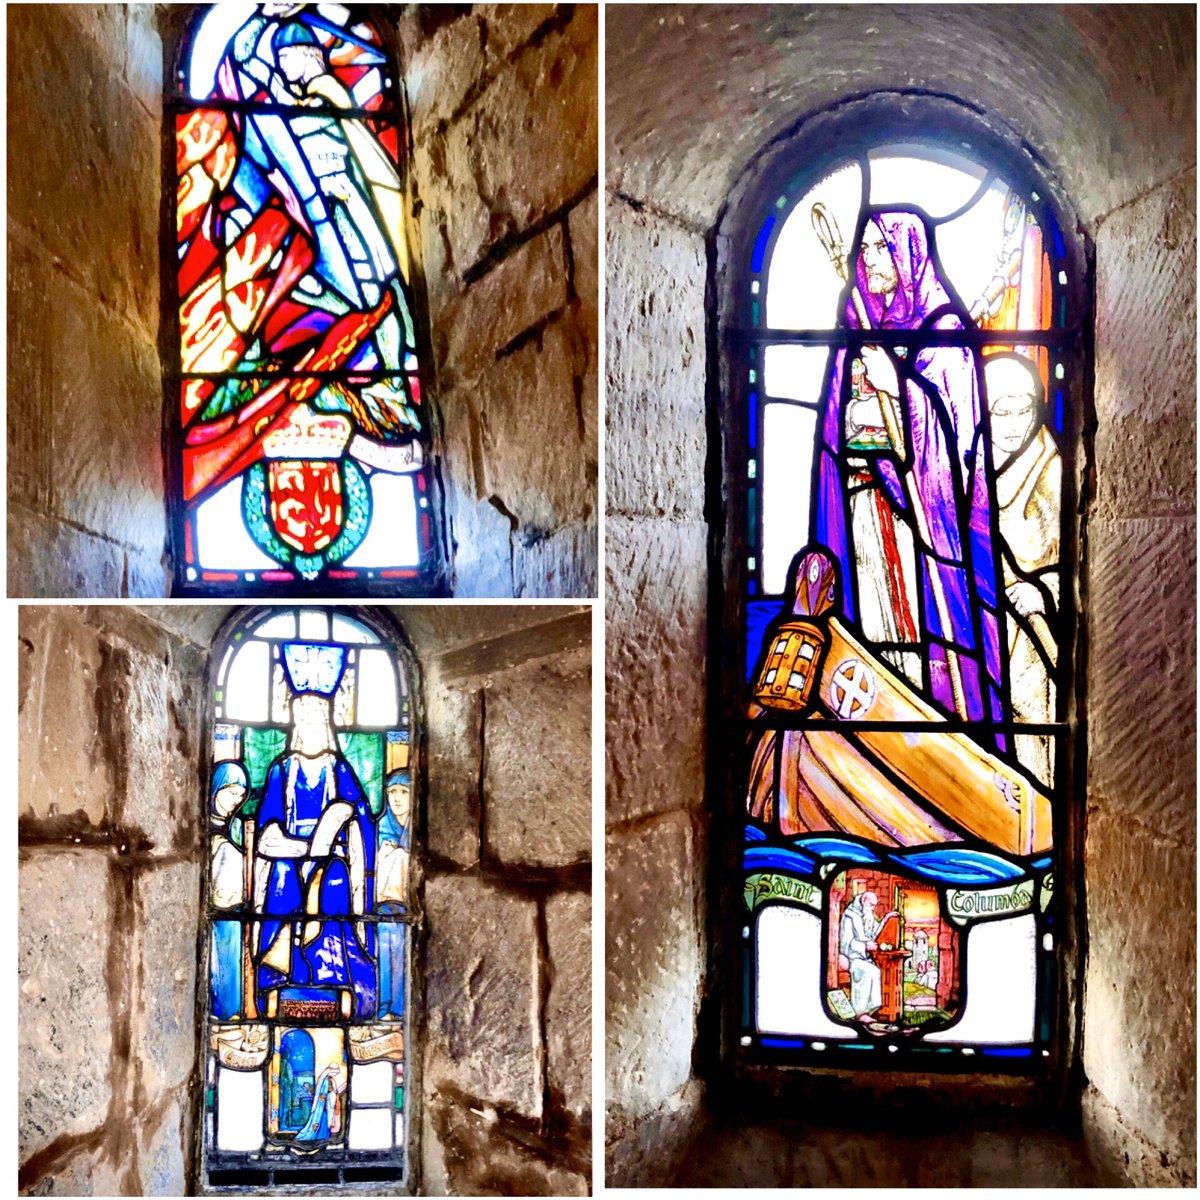 Chapel windows in Edinburgh Castle #SundayMorning #StainedGlass<br>http://pic.twitter.com/BWXzFRzvXN